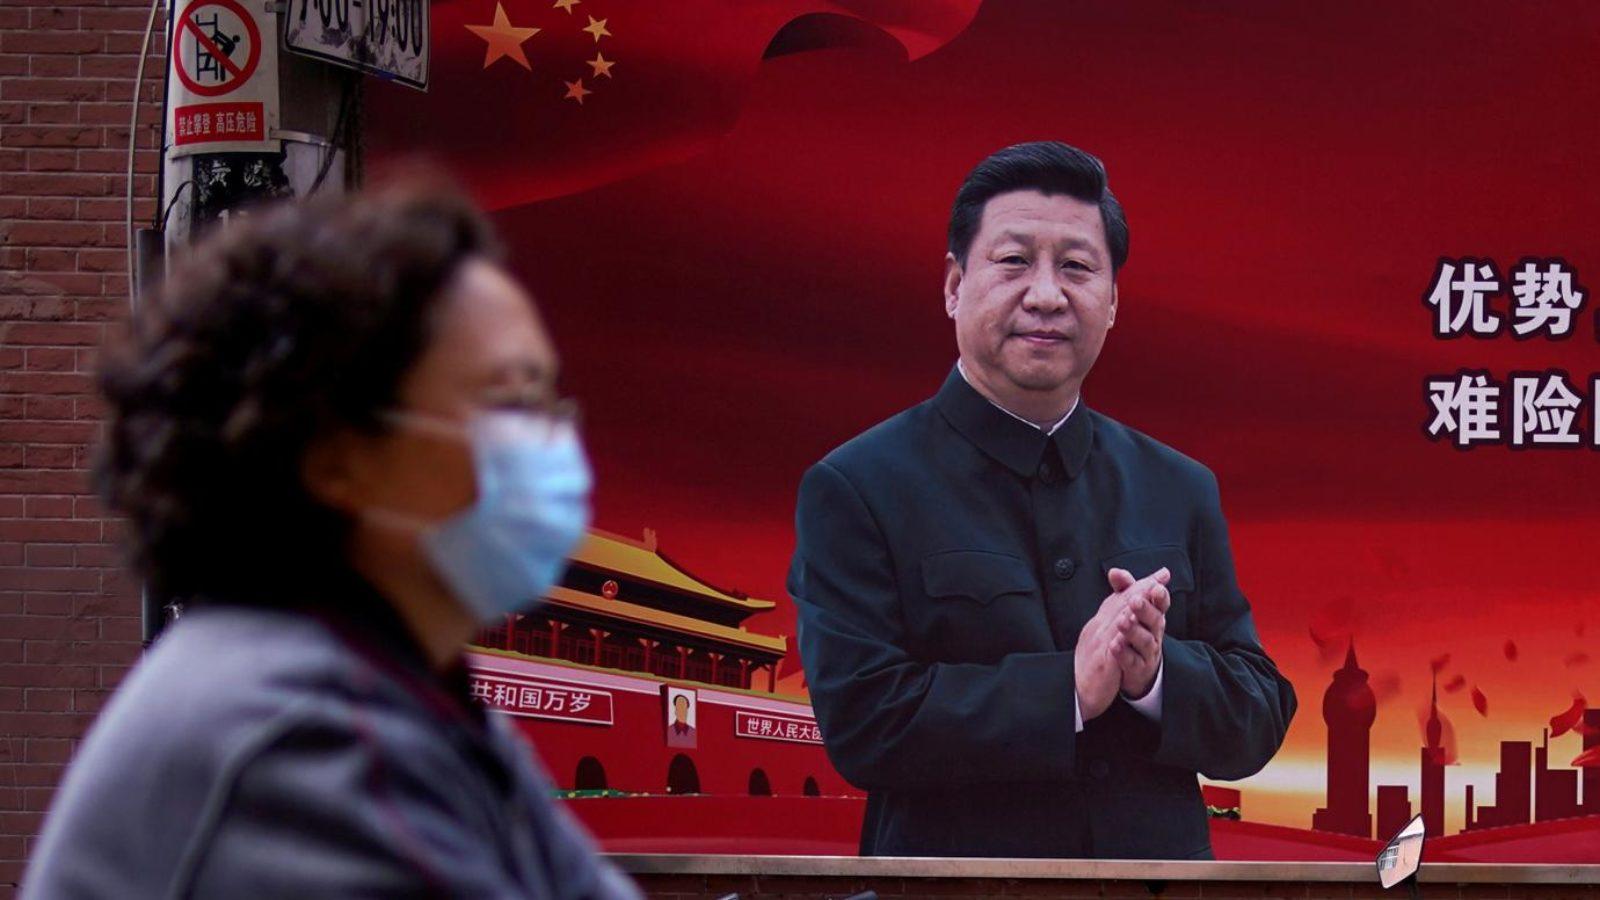 Poster of Xi Jinping